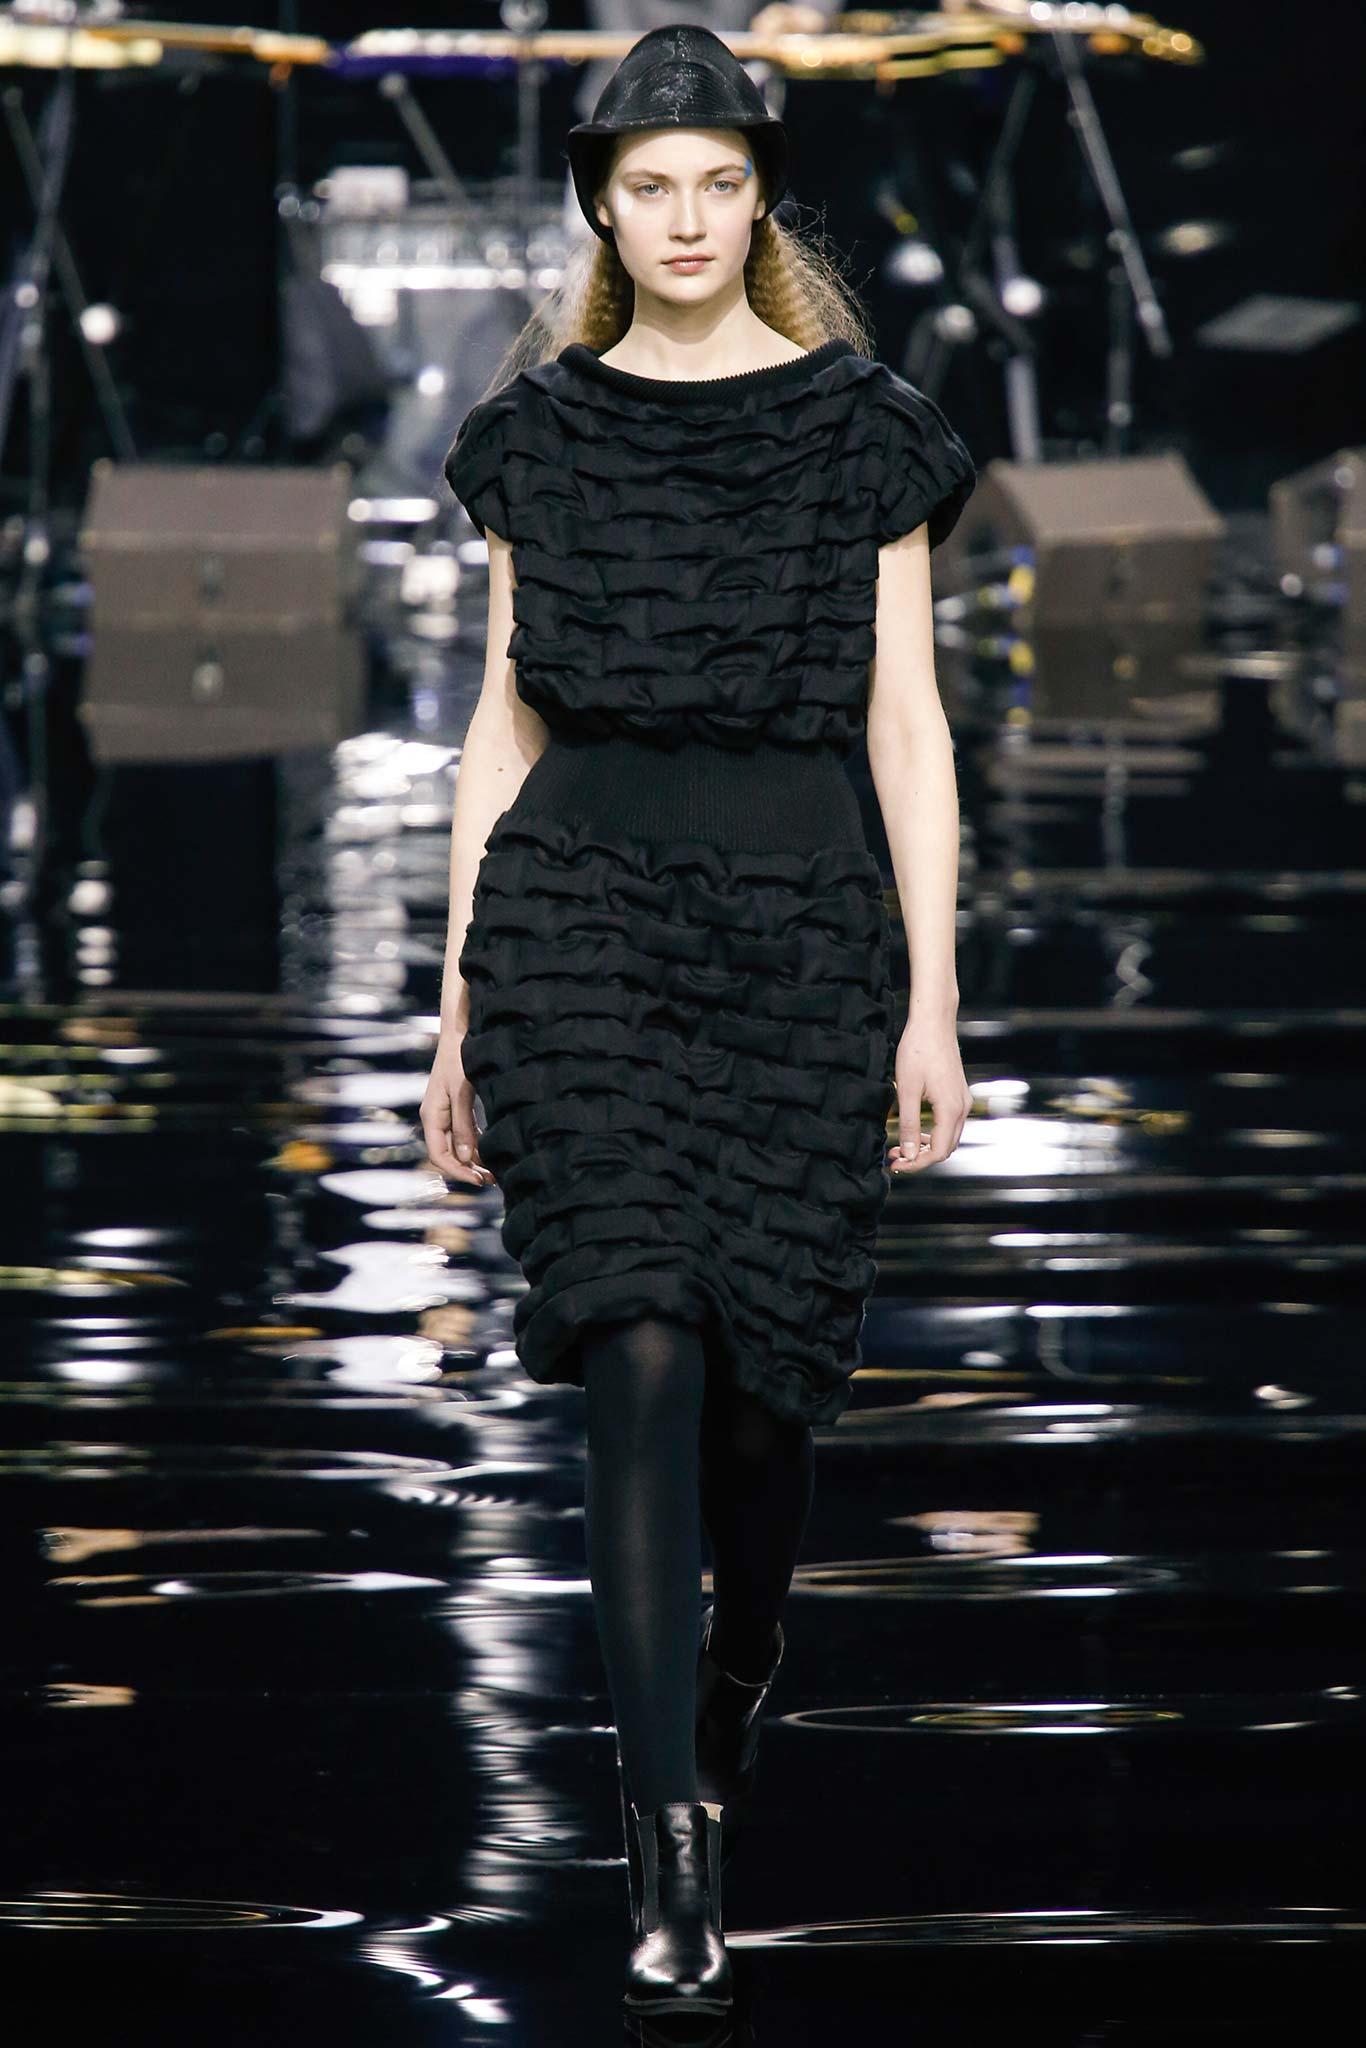 IFA review- Issey Miyake at Paris Fashion Week for Drapes In Garments  113lpg